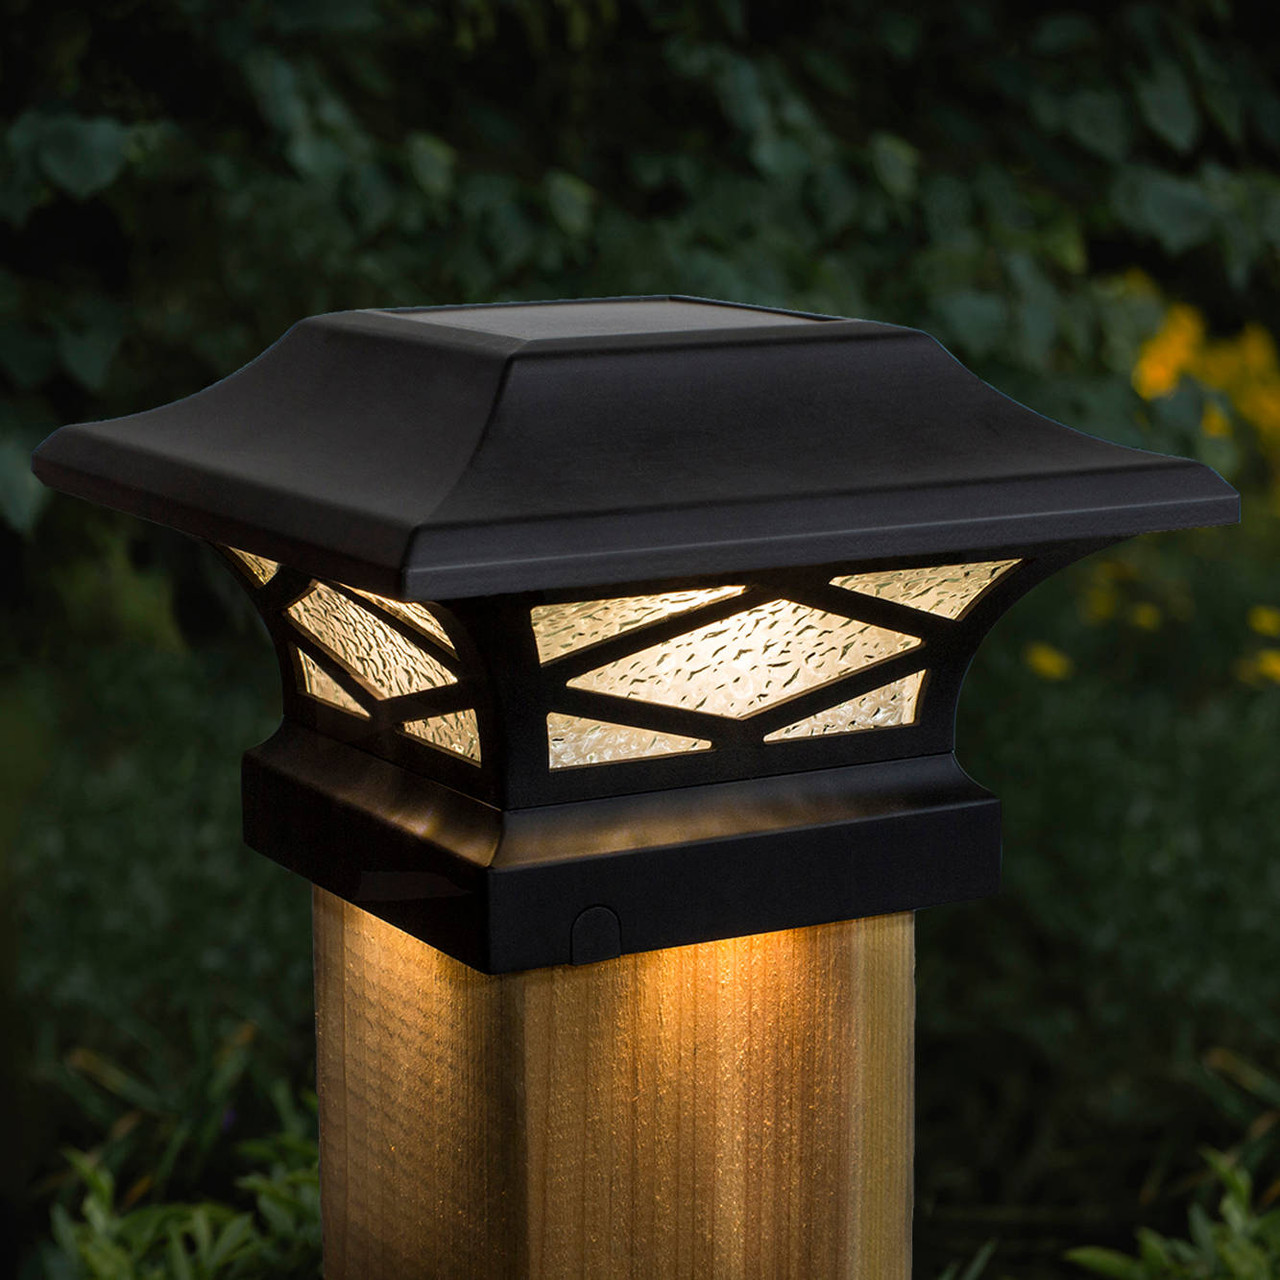 Kingsbridge Black Solar Post Cap on Wood Post